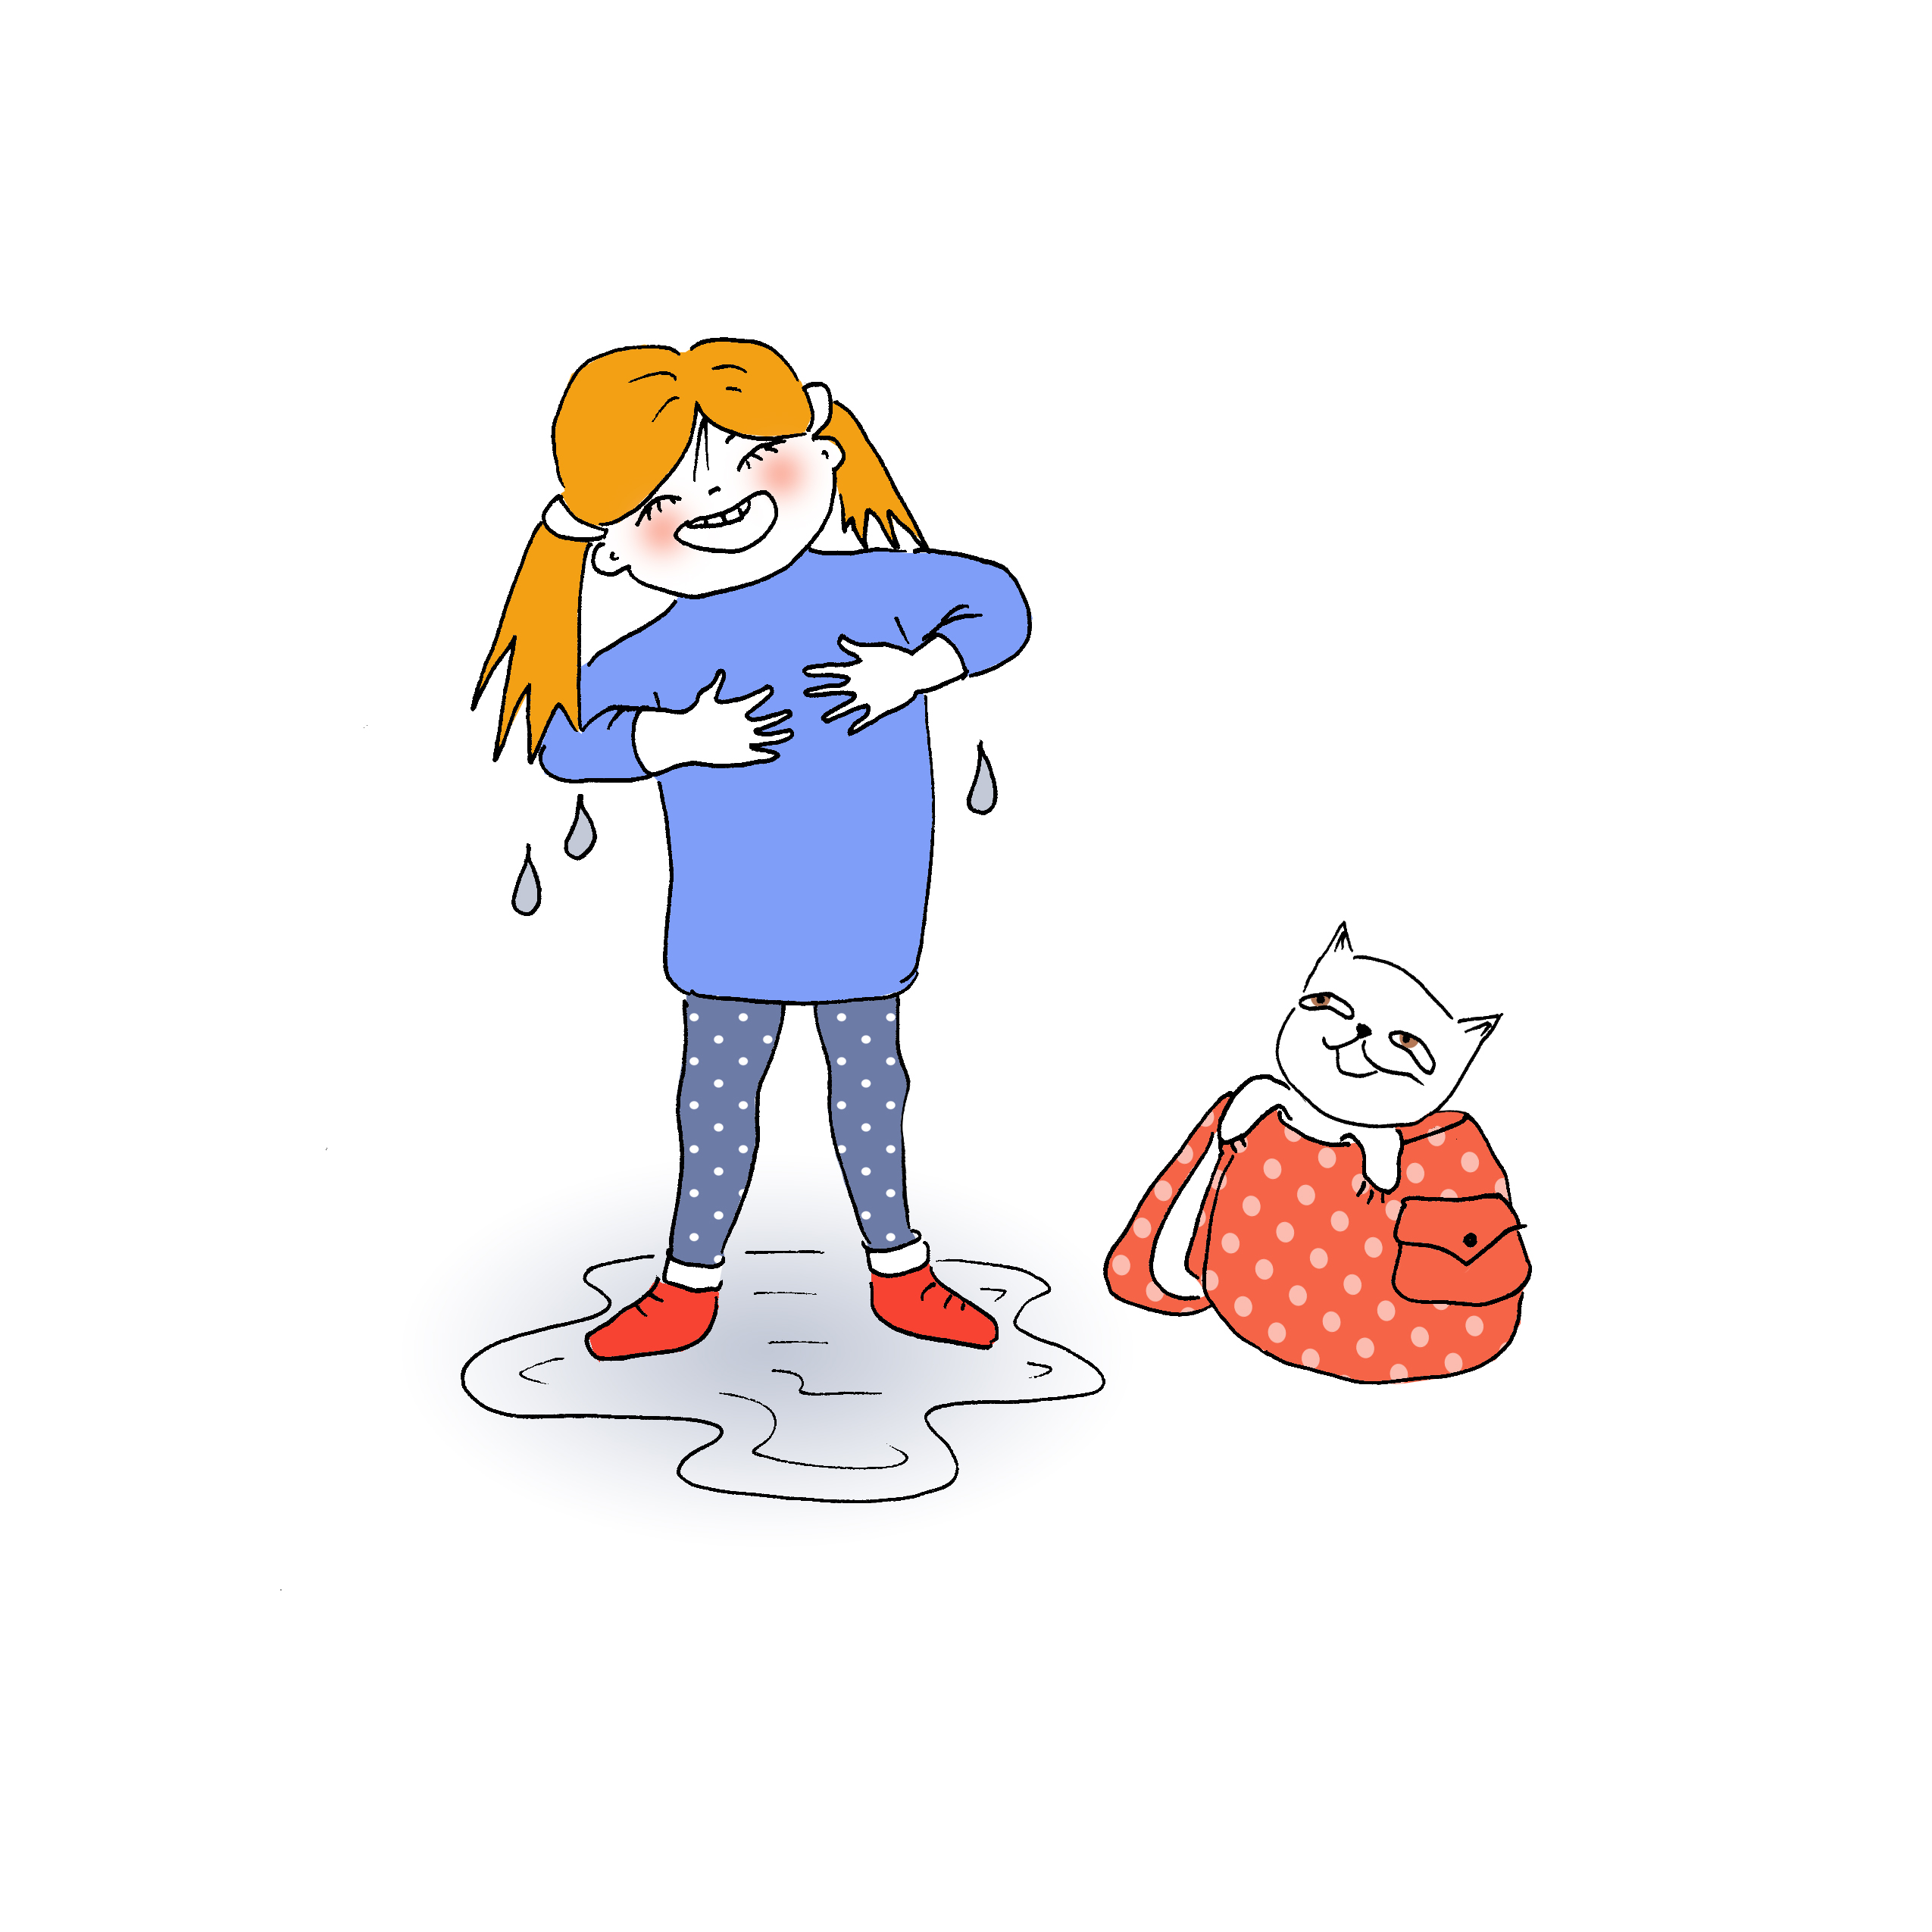 Мими&Китти – 12 – Почти by Irena Brodeski - Illustrated by Irena Brodeski - Ourboox.com